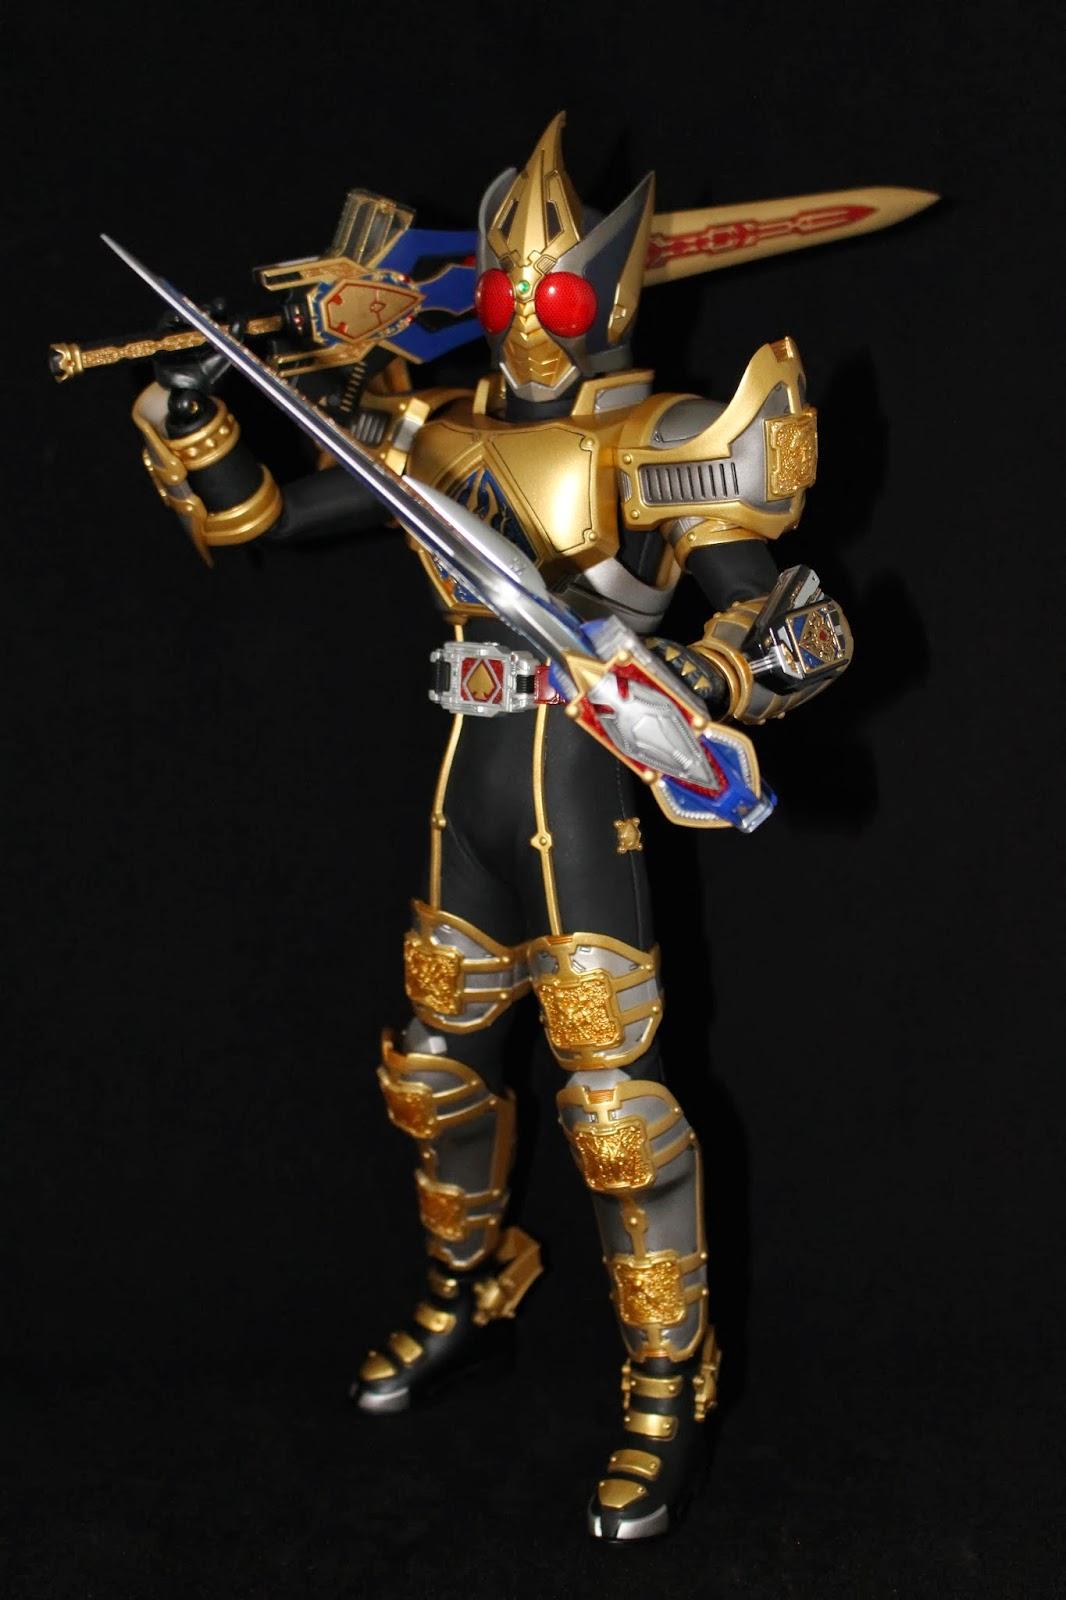 UZU's Hobby Collectible & Others : MEDICOM TOY RAH DX ...